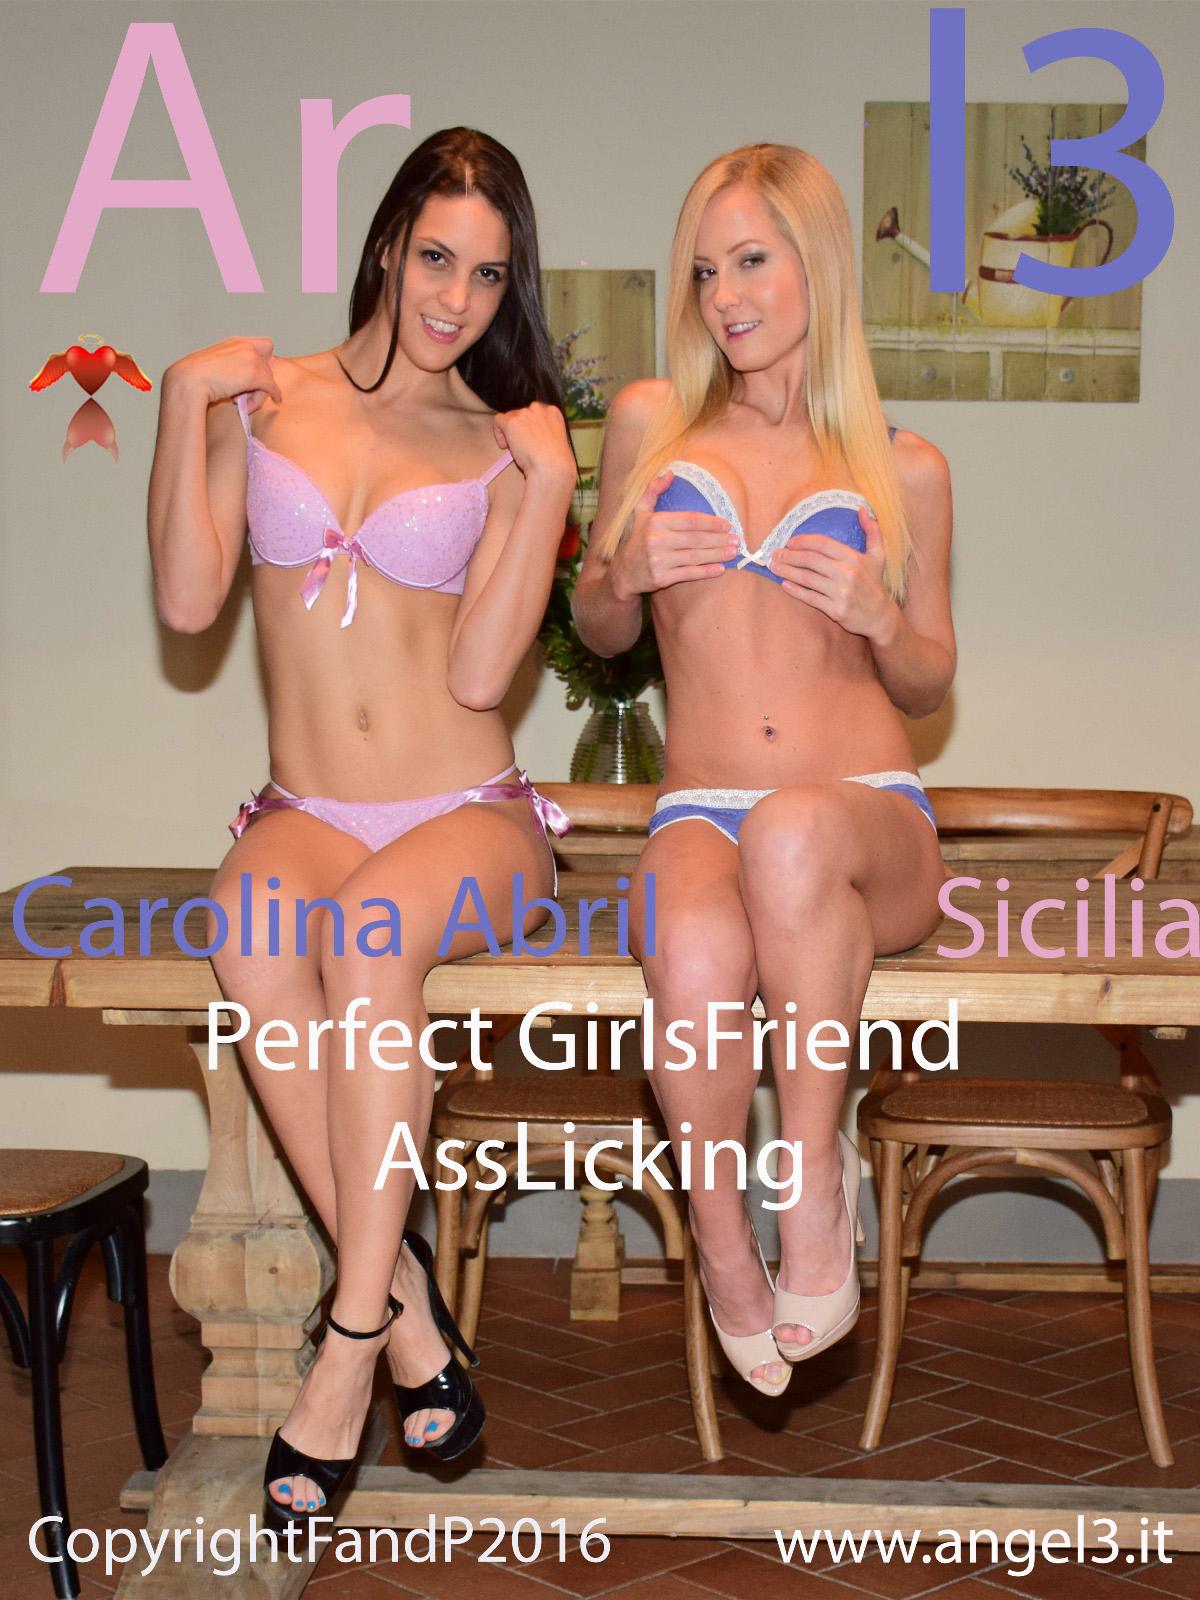 carolina-abril-sicilia-perfect-girlsfriend-asslicking-p